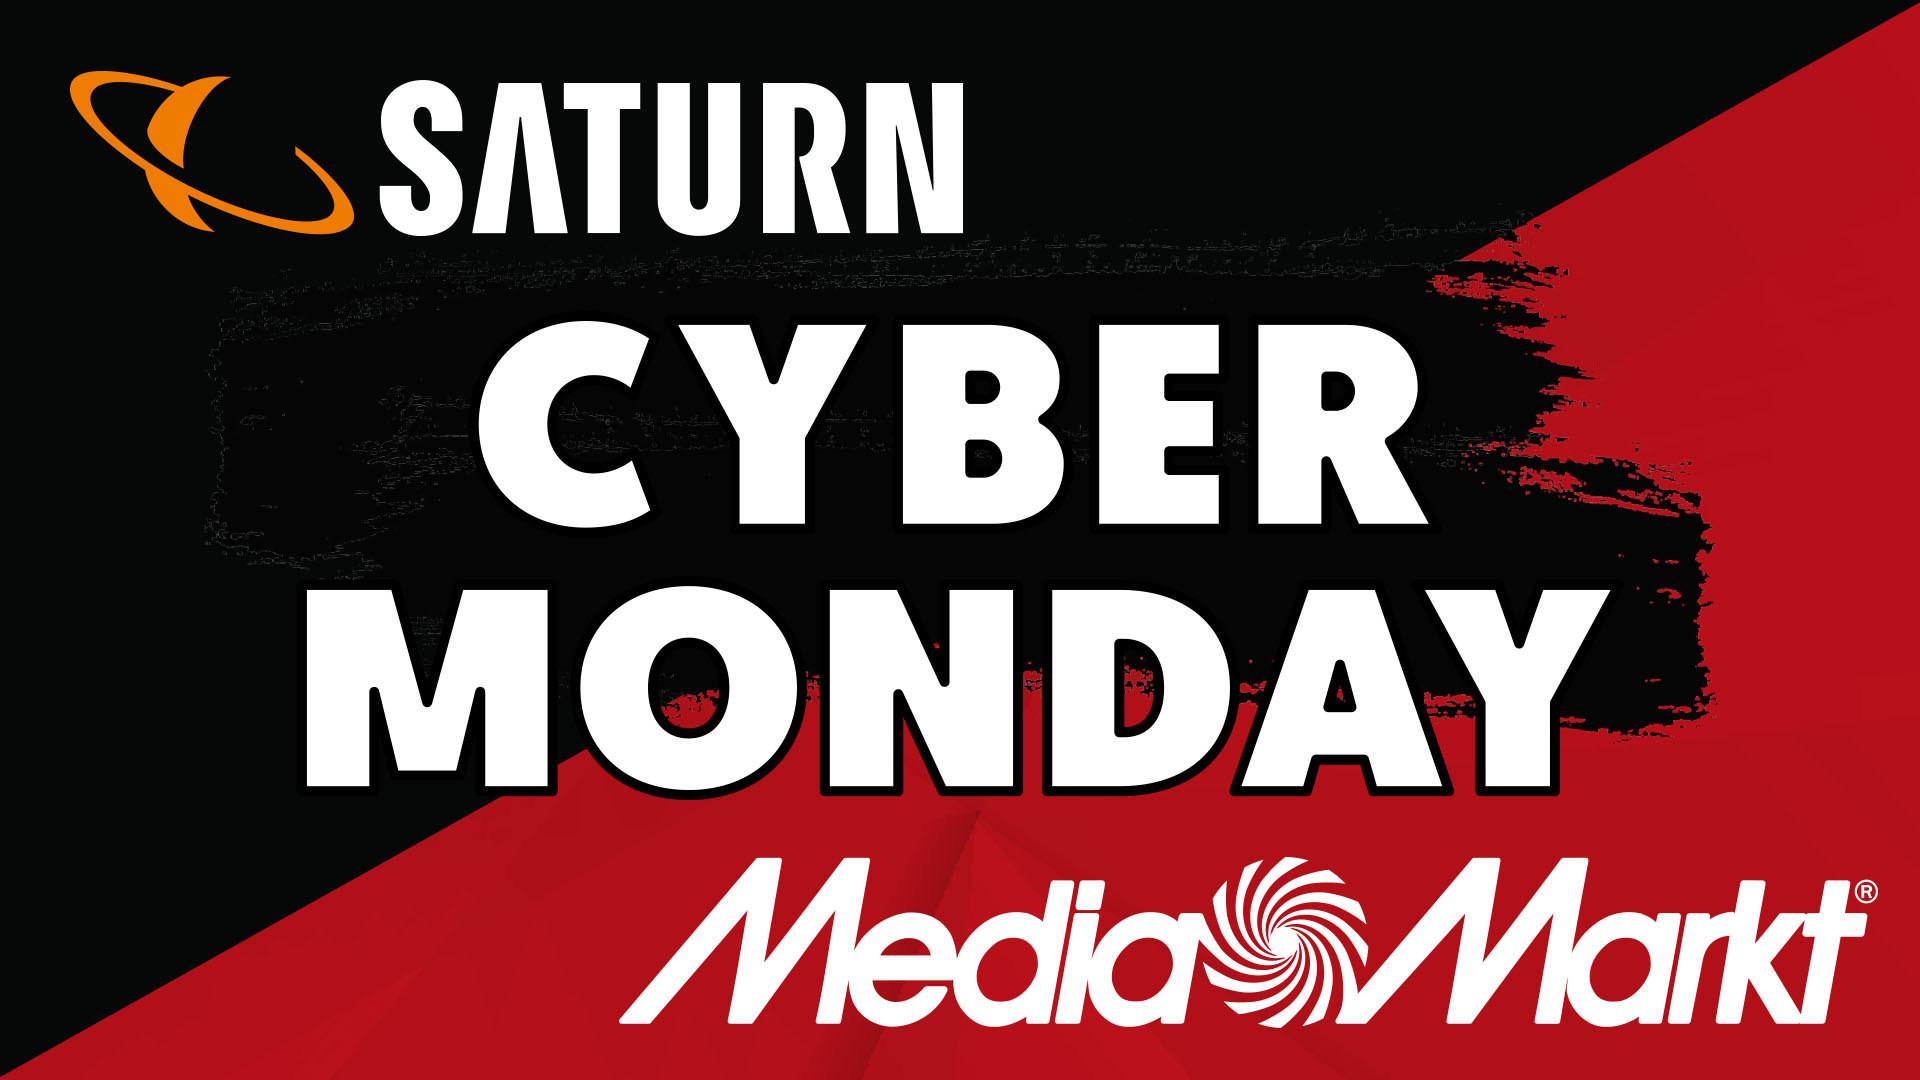 Saturn, Media Markt, Cyber Monday, Mediamarkt, Cybermonday, Kombination, Kombi